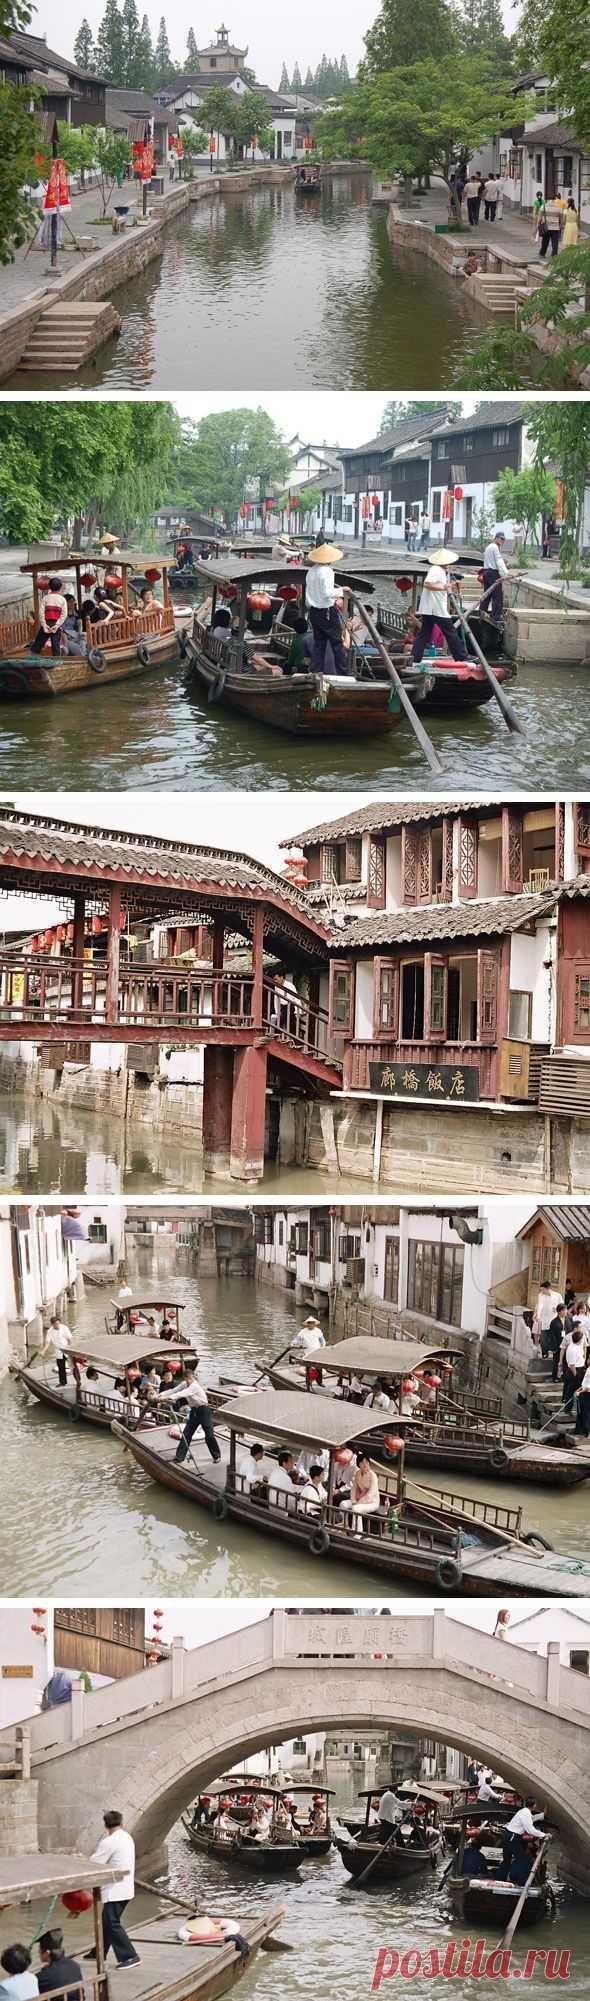 Шанхайская Венеция. Чжуцзяцзяо, Китай